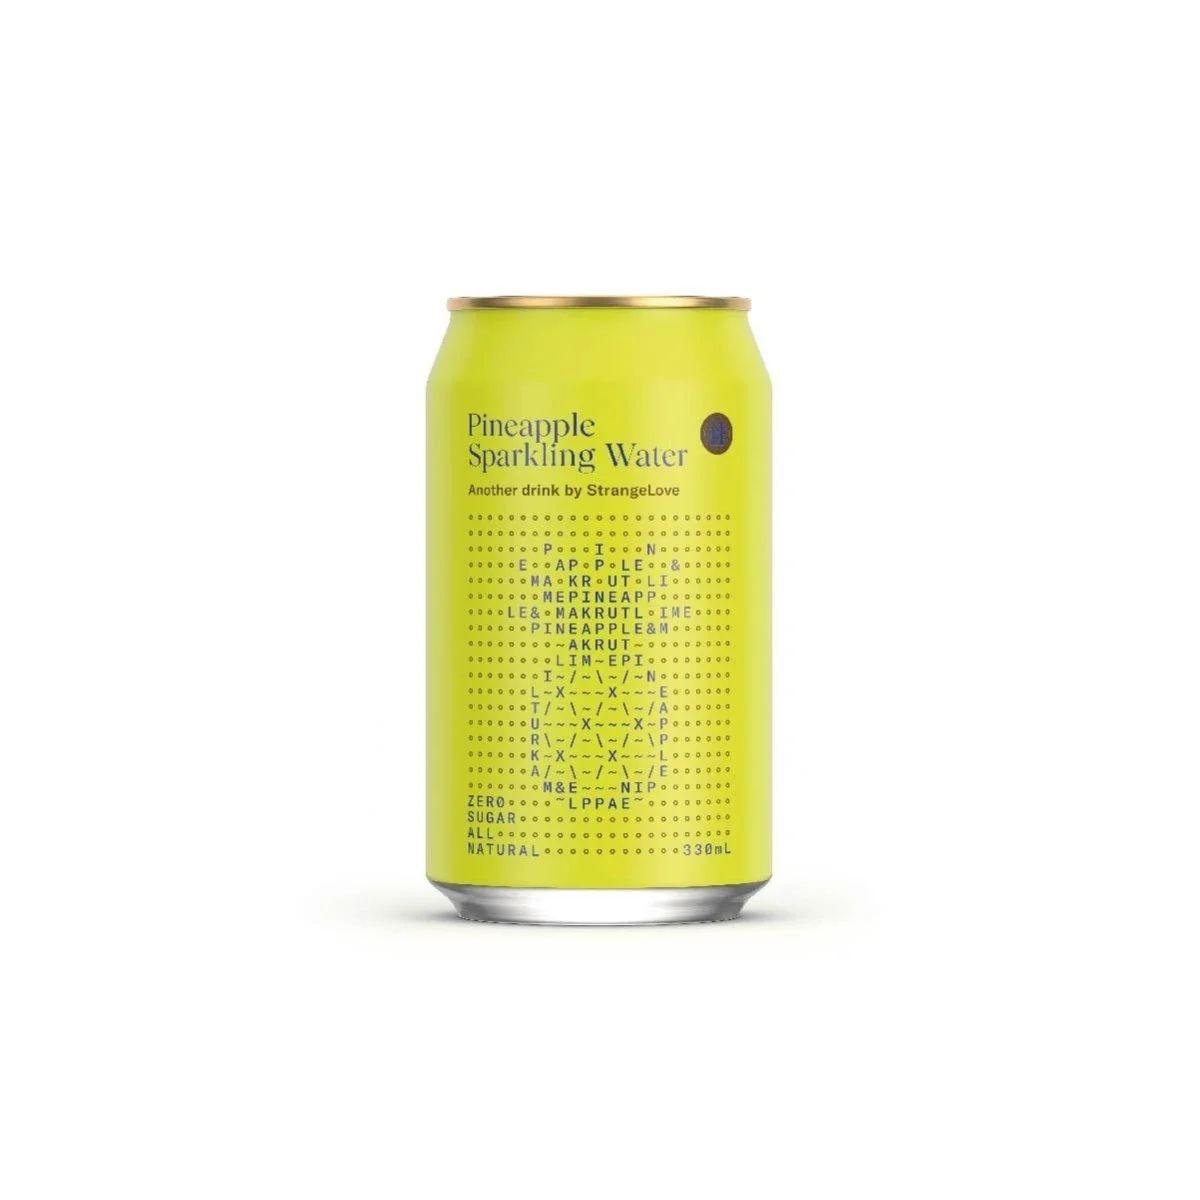 StrangeLove Water - Pineapple Sparkling